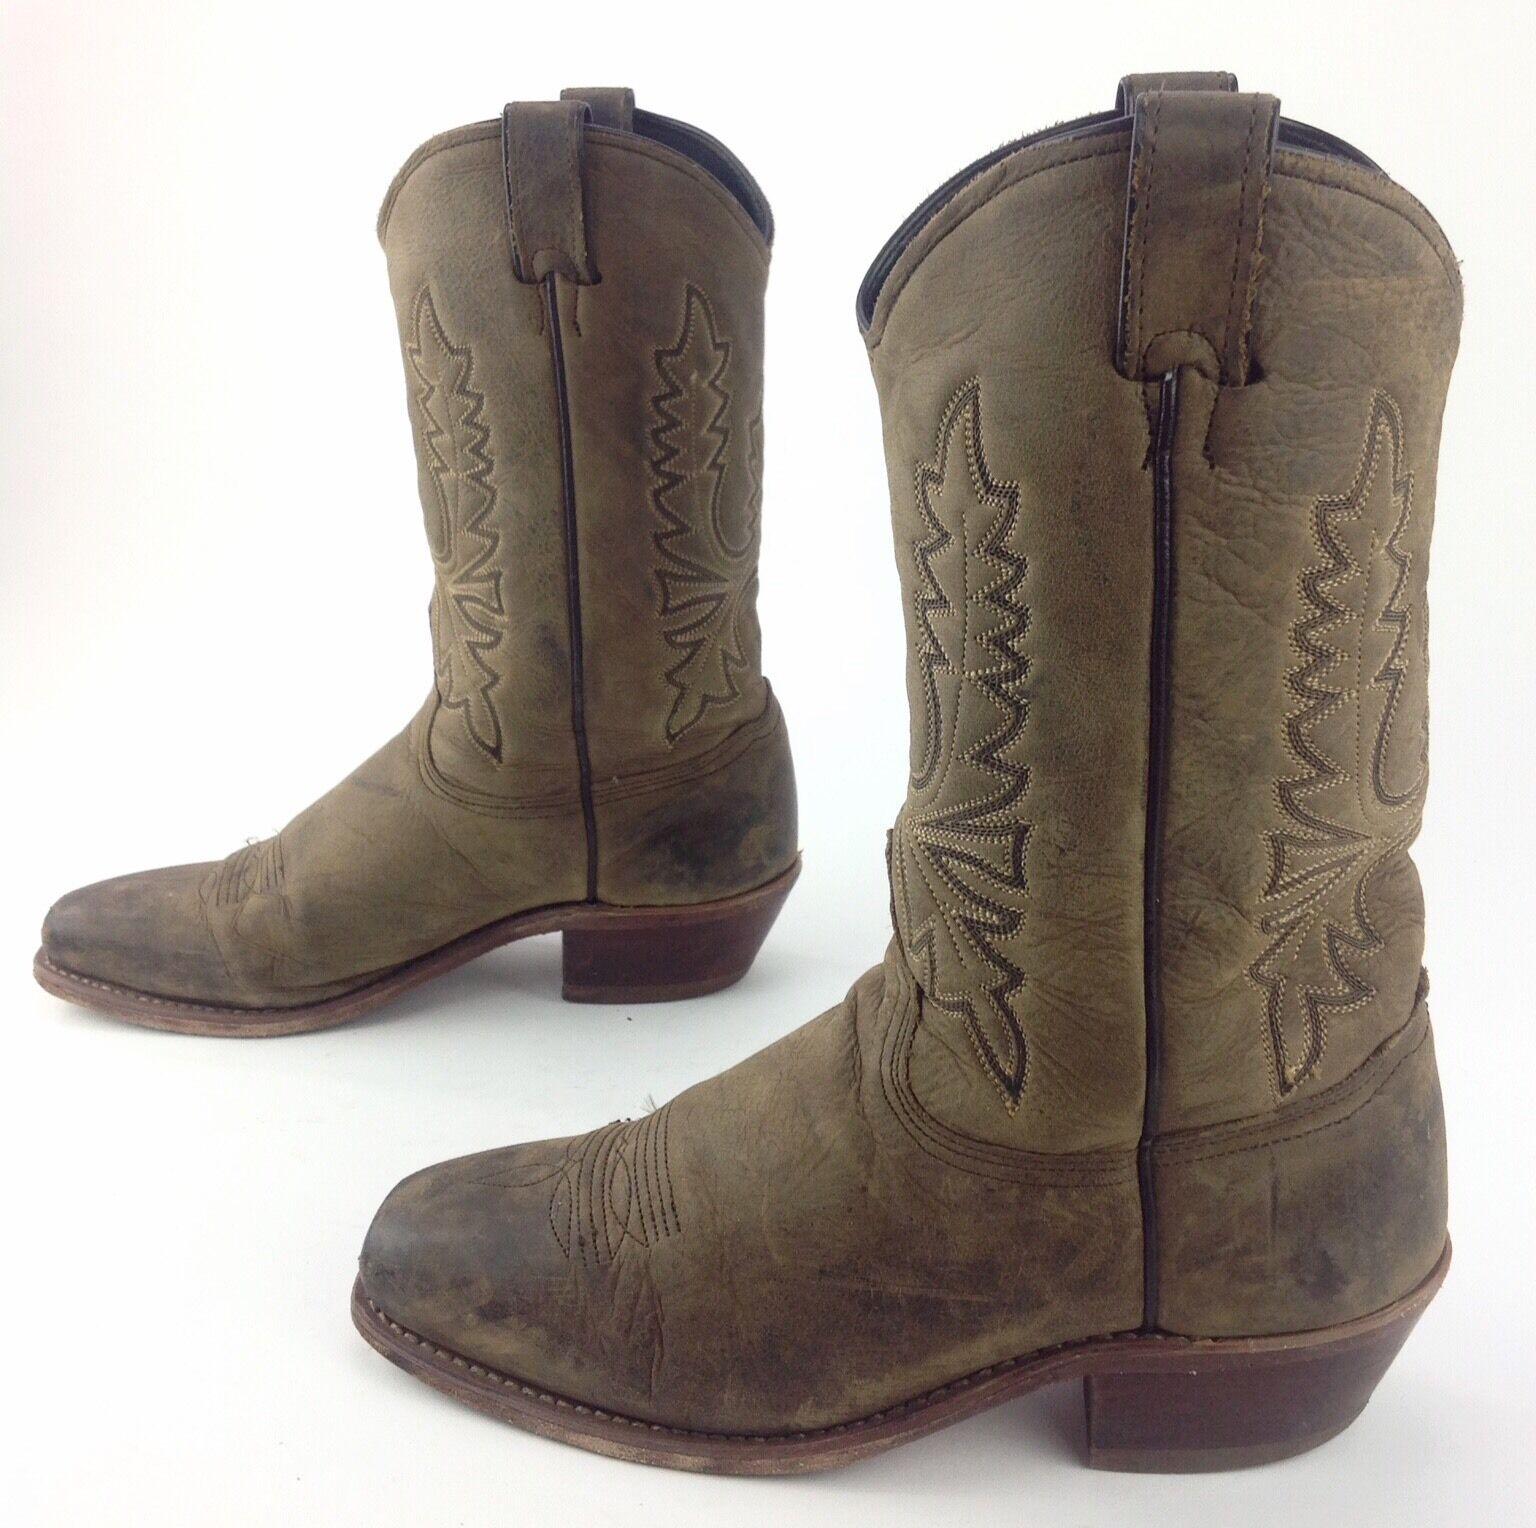 Donna Brown Pelle Pelle Brown Square Toe Cowboy Western  A Made Stivali Sz 9 1/2 5e85cc